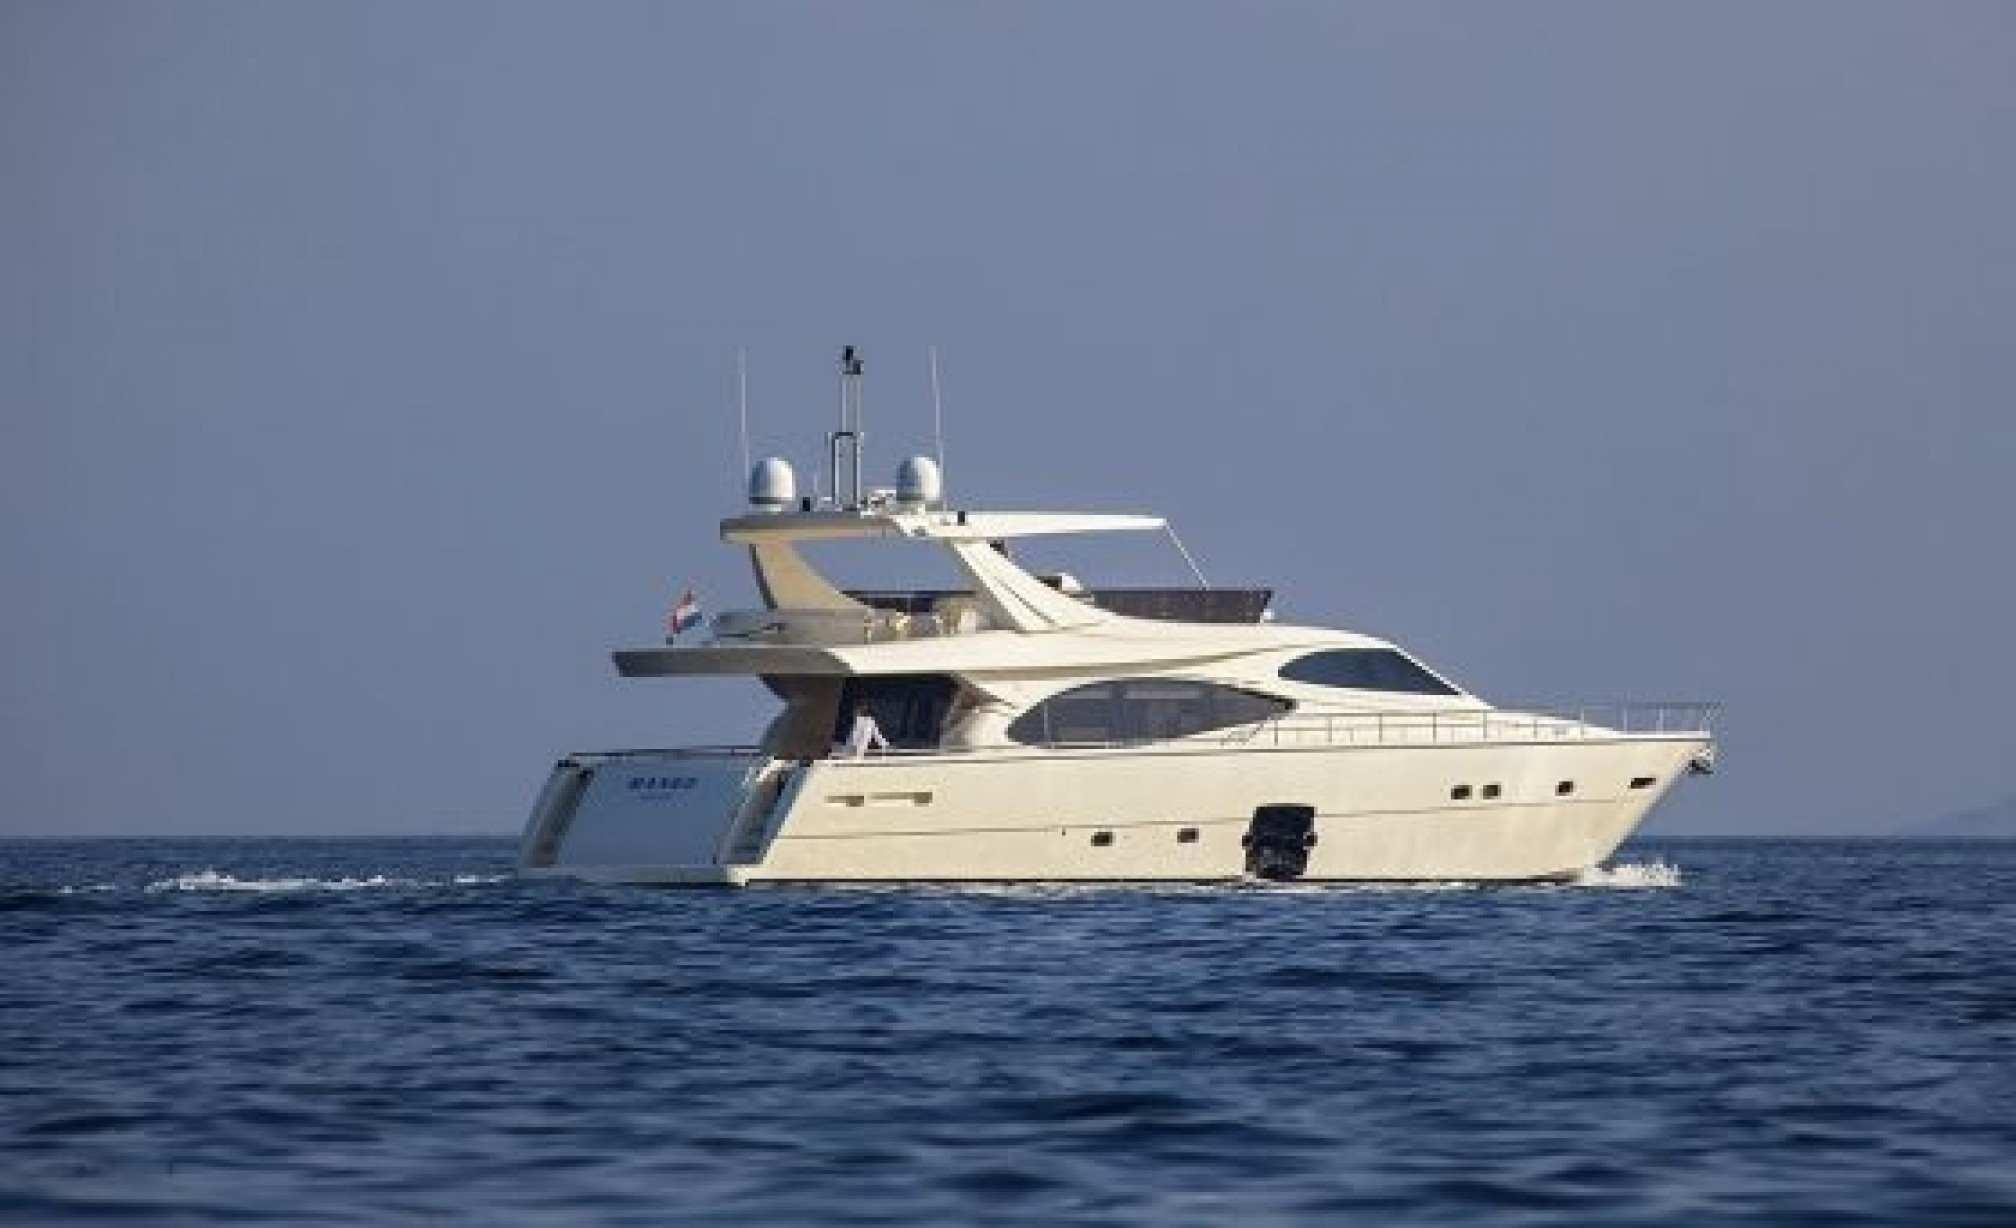 Ferretti 780 charter yacht sailing